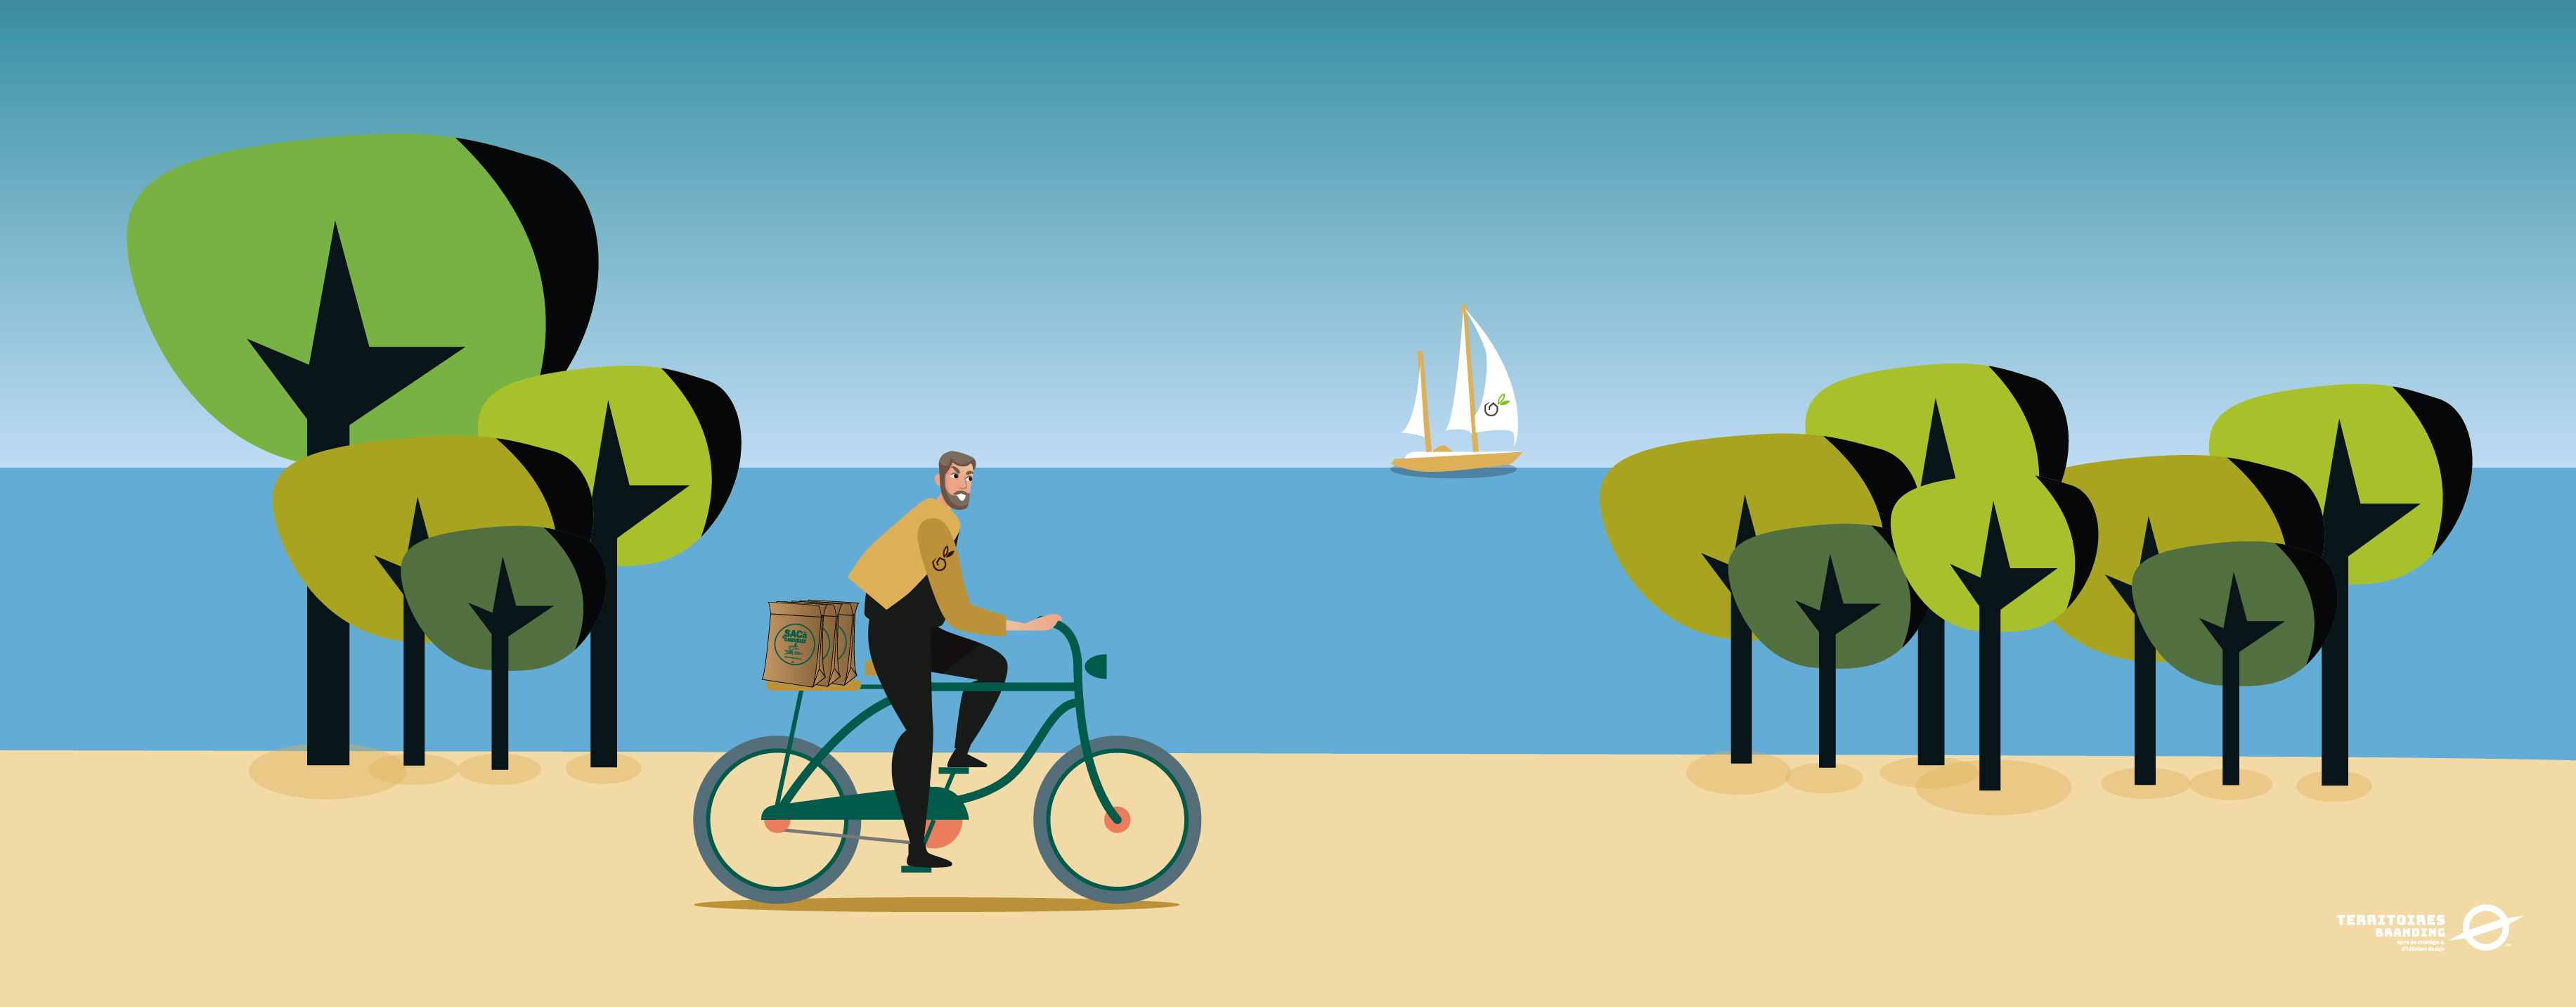 coiffeurs-justes-vélo